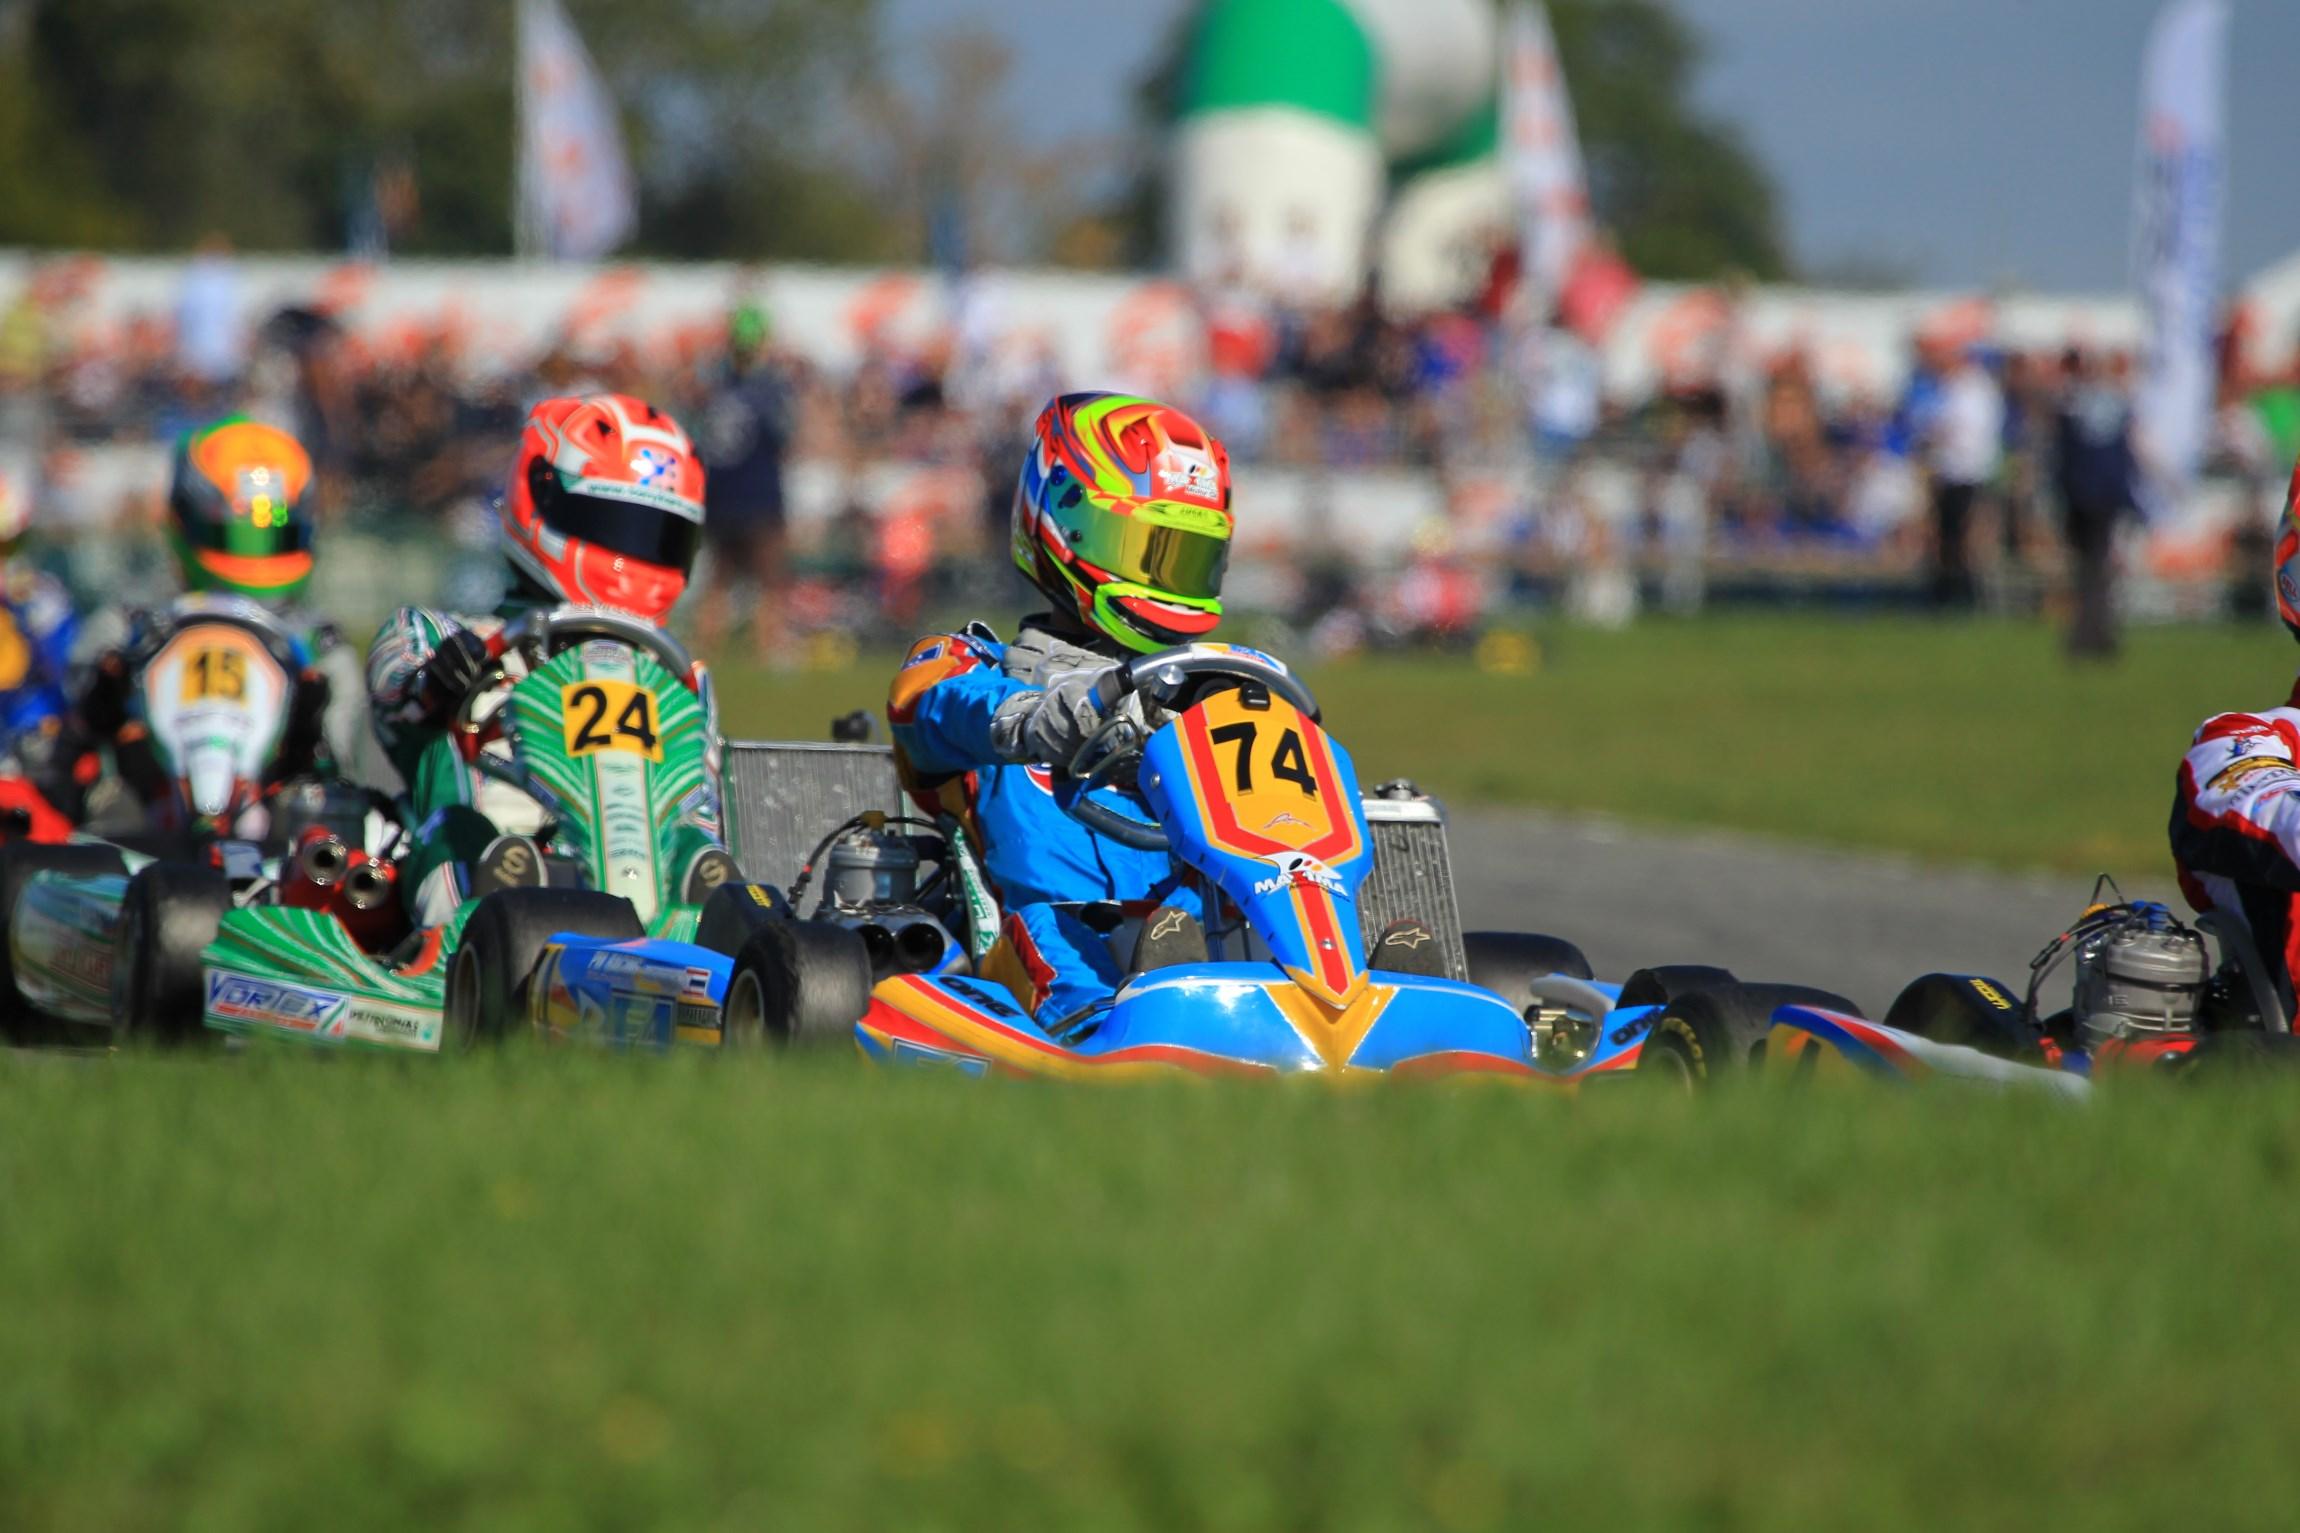 PM Racing Testtage in Genk